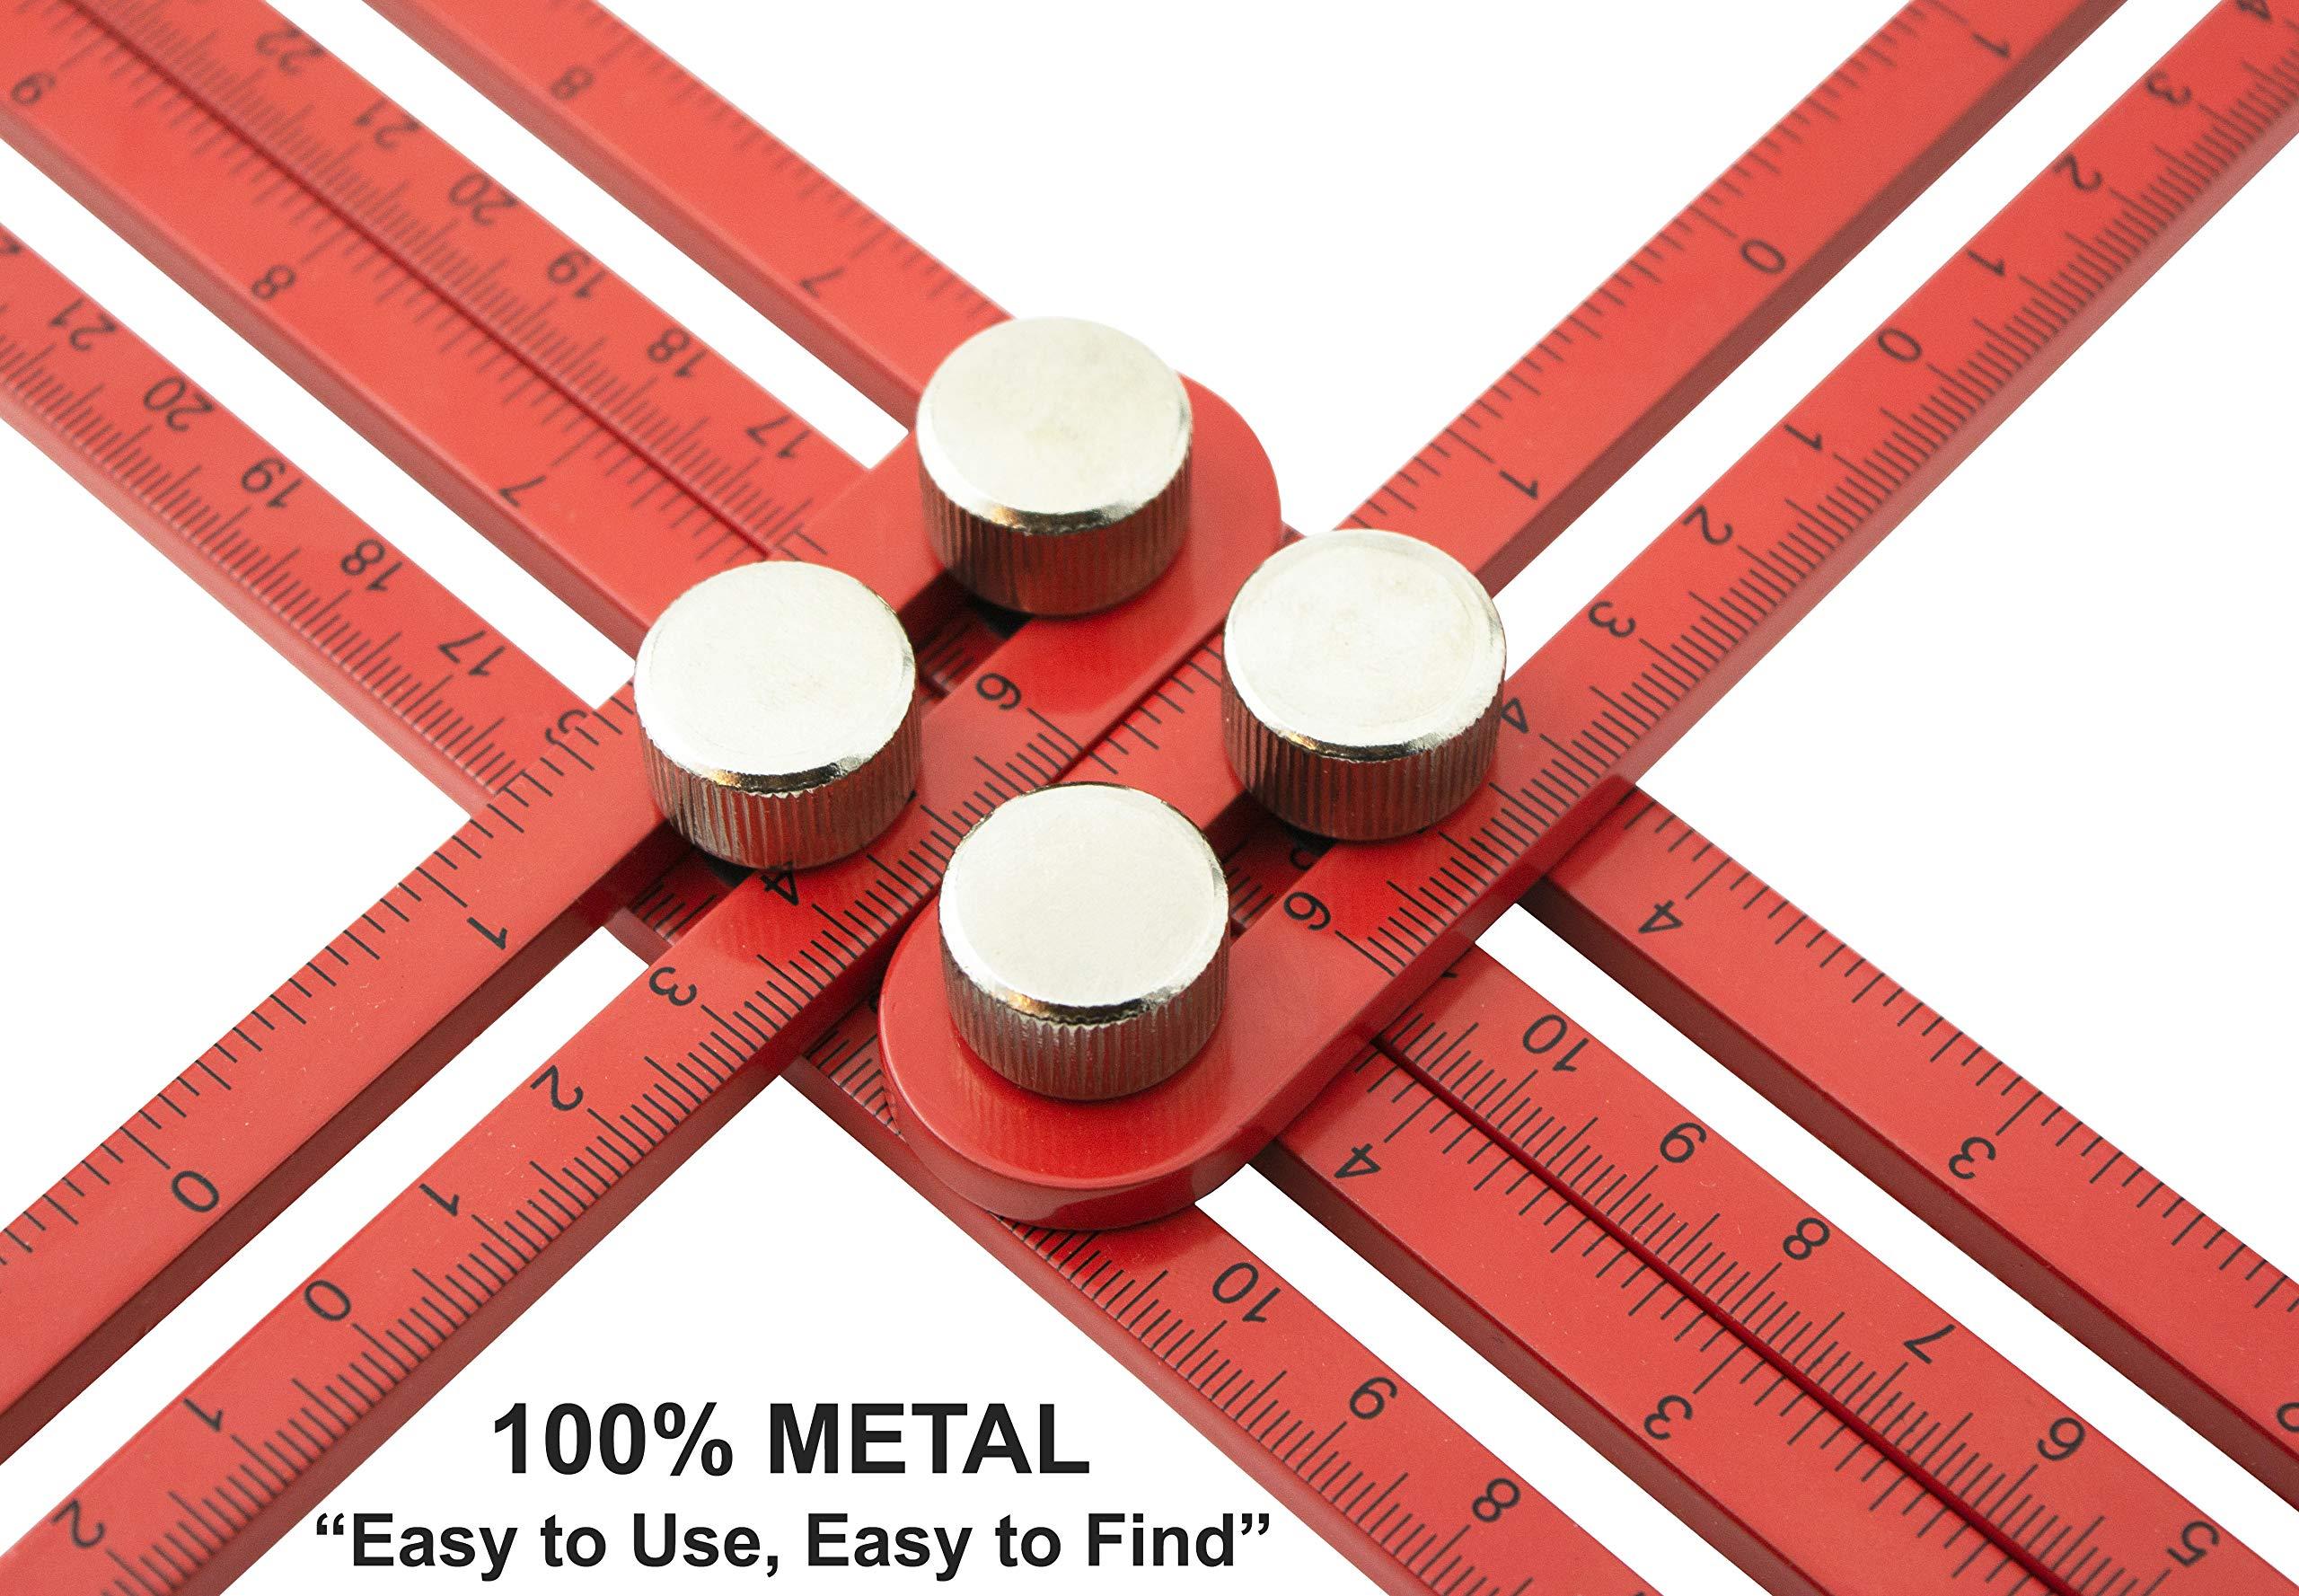 GoodLife USA - Original RED Aluminum Alloy Multi Angle Measuring Ruler - Universal Angleizer - Template Layout tool - Scale Ruler - Angularizer ruler - Multi Functional Angle measurement tool (RED)